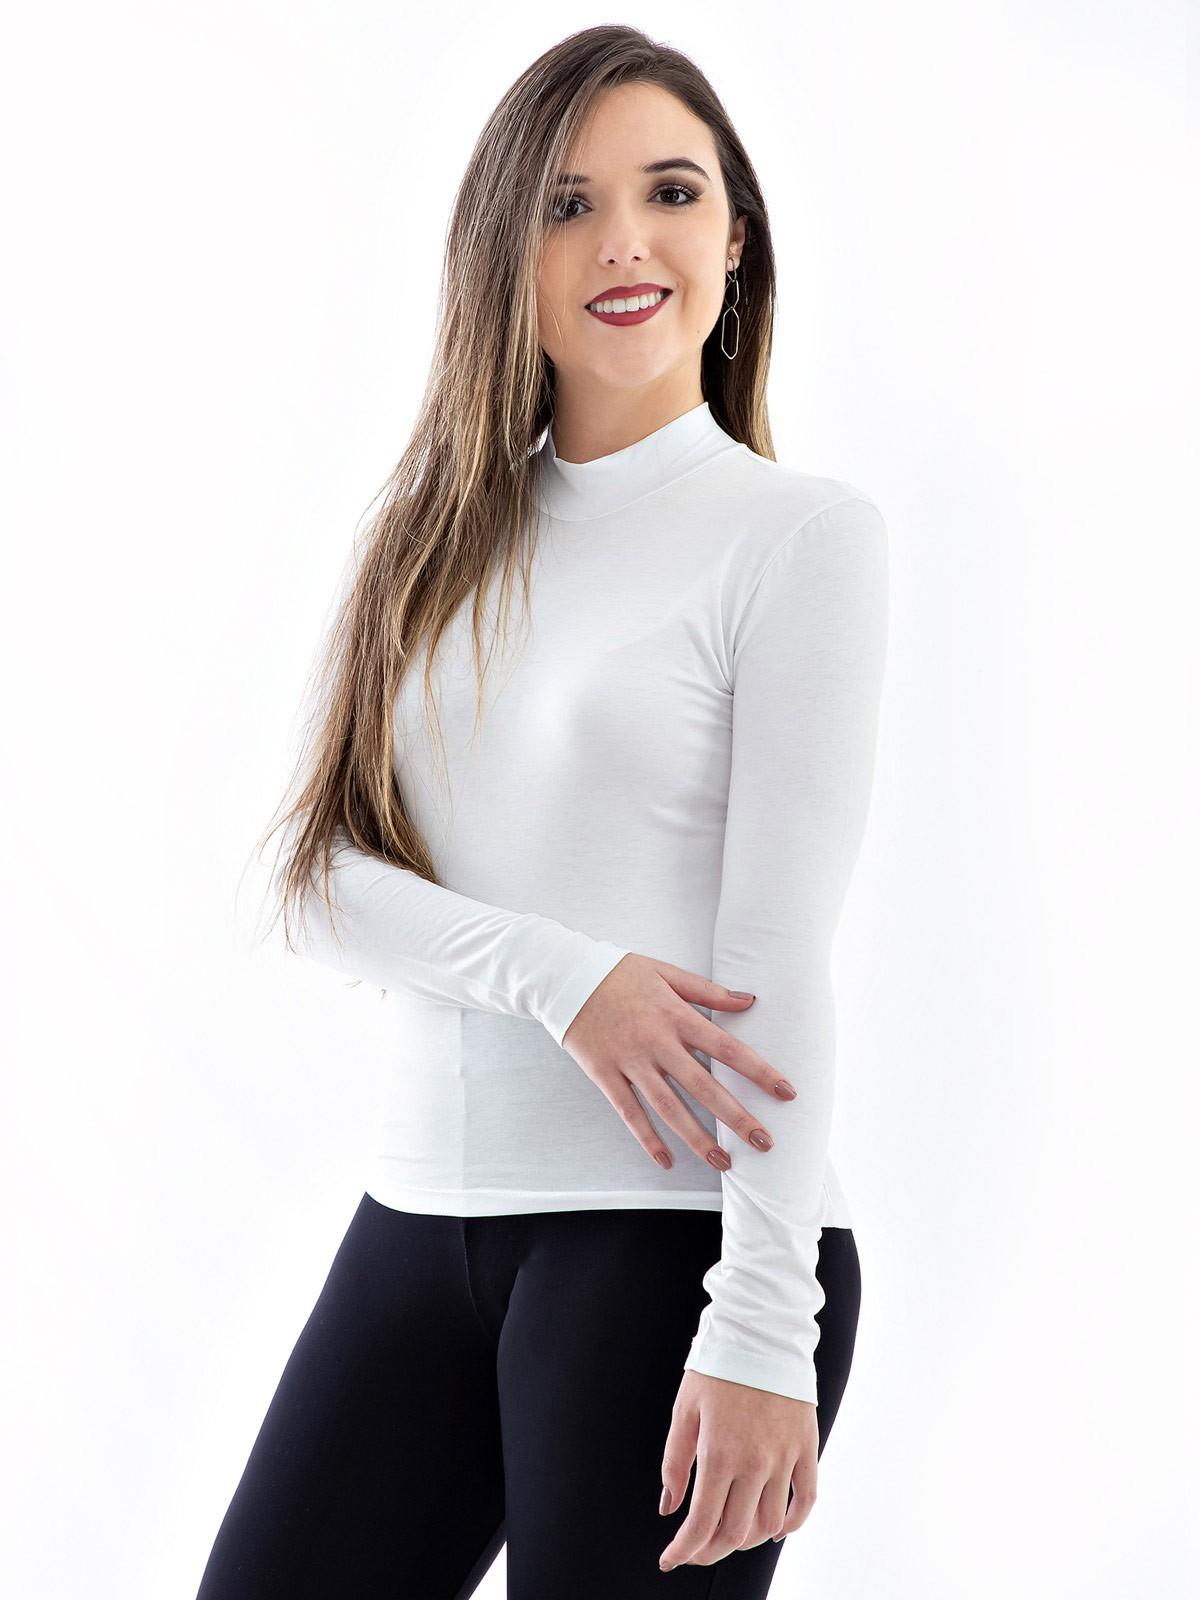 Blusa Gola Alta Feminina De Viscolycra Mangas Longas Branca